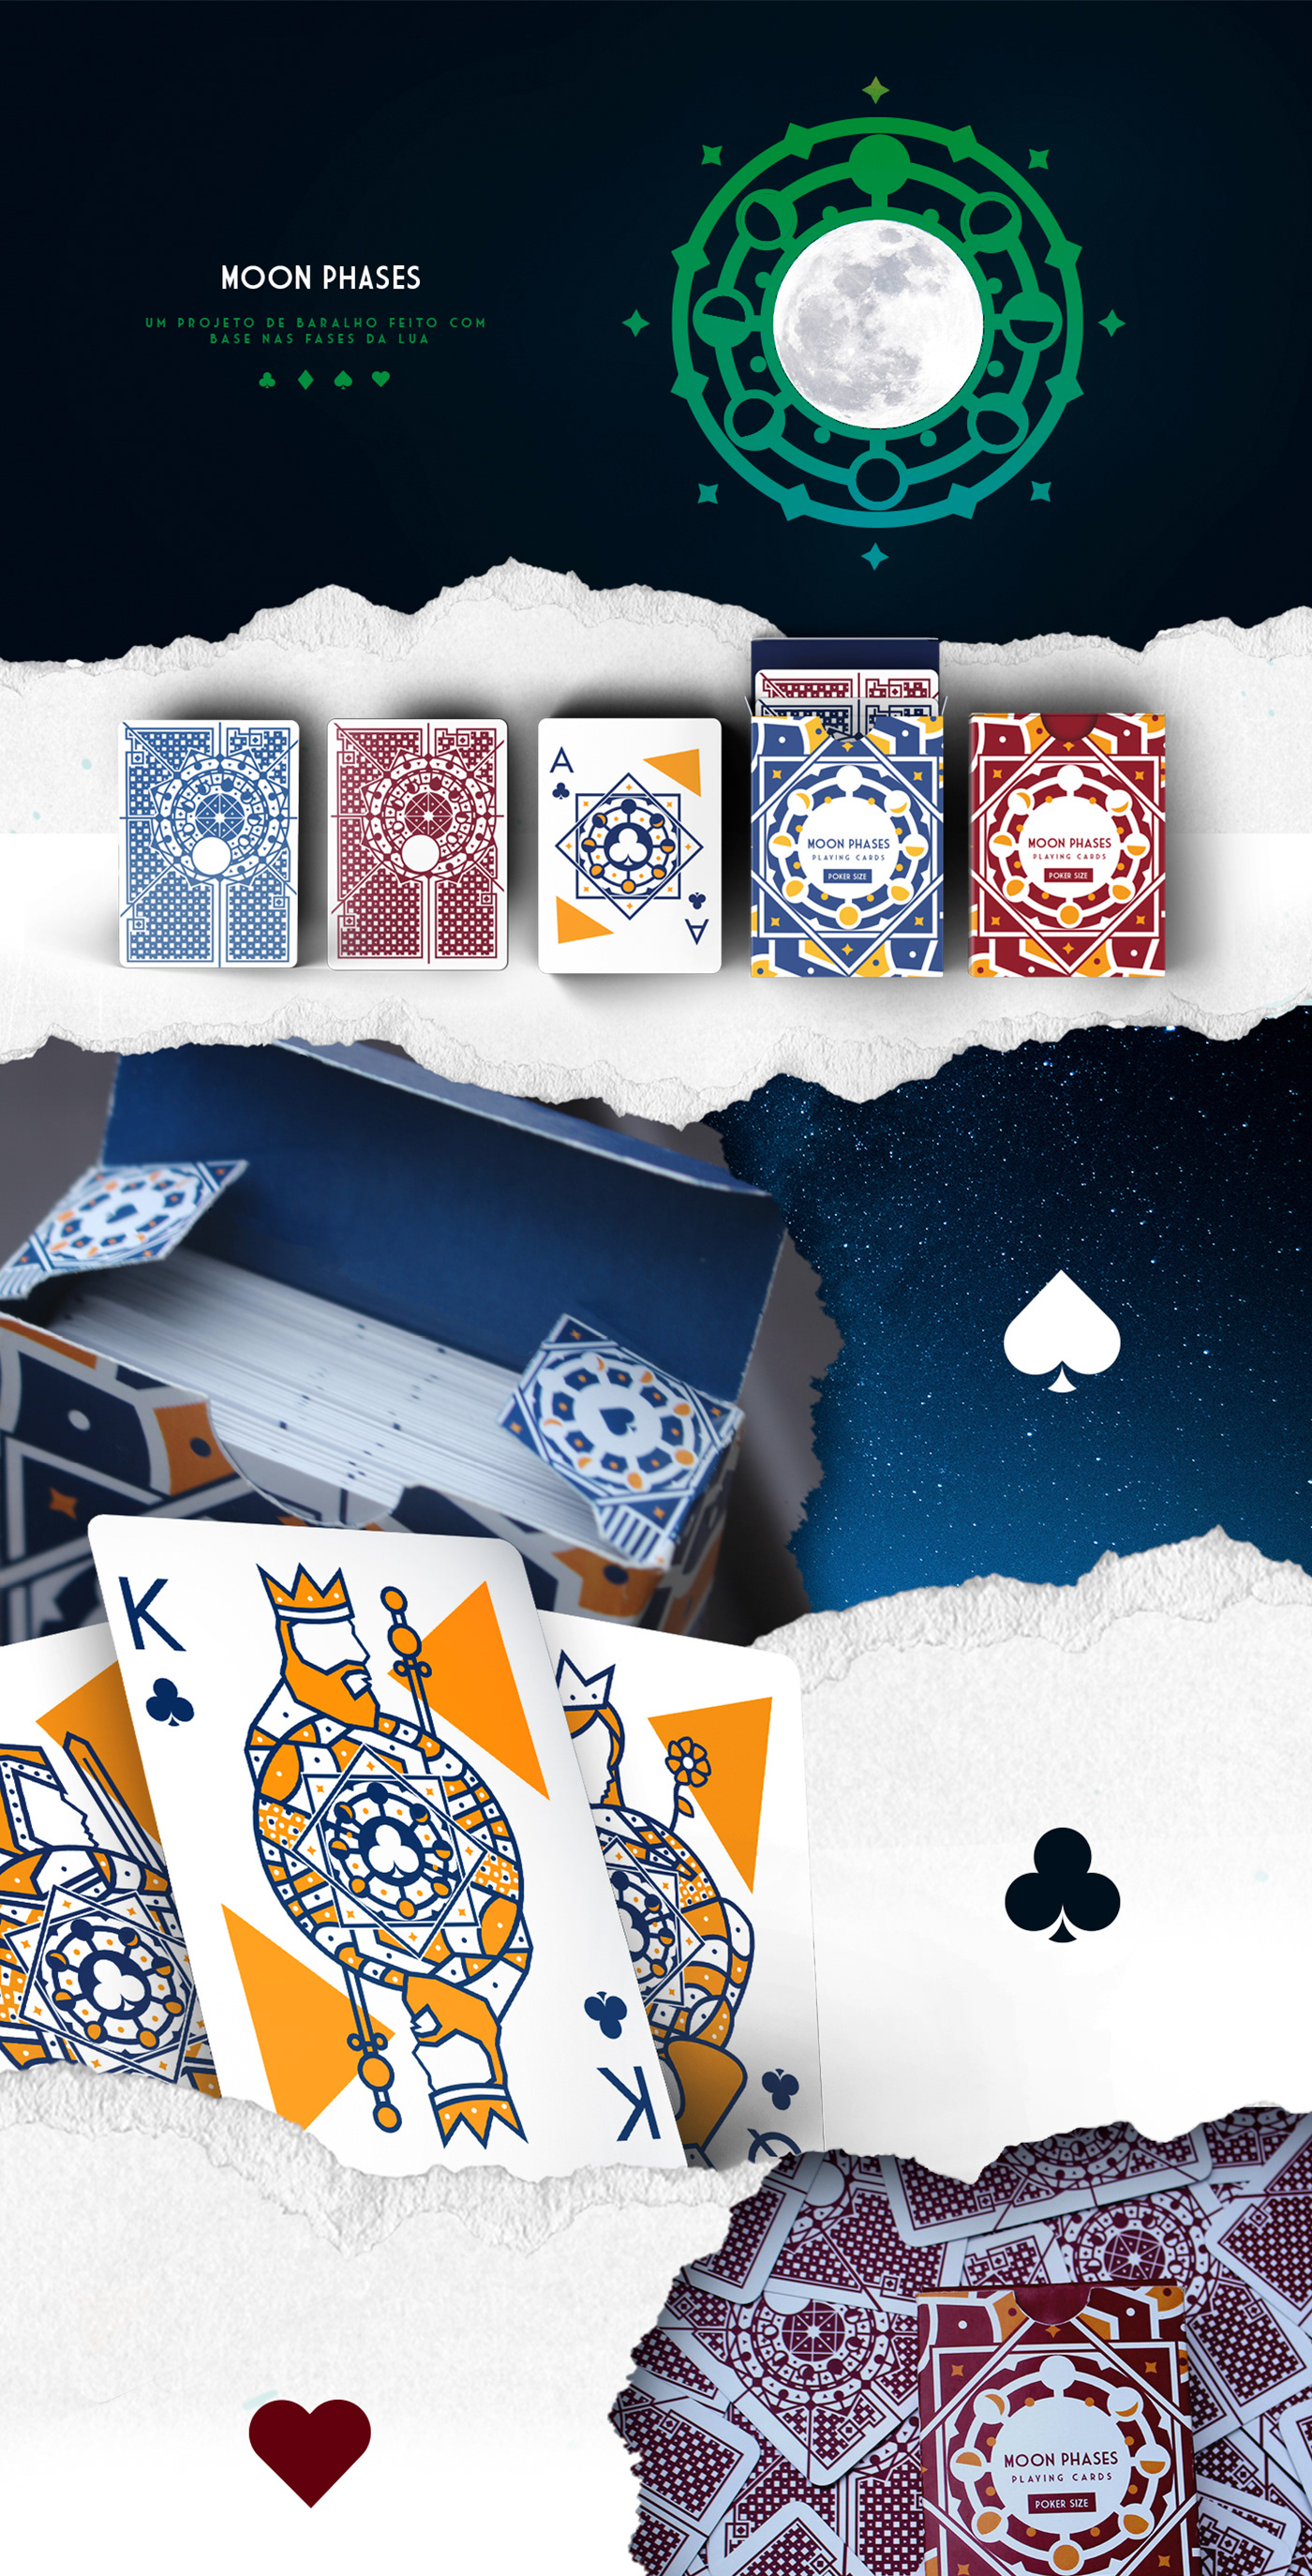 Playing Cards moon cards stars deck cartas Baralho Lua Poker Magic